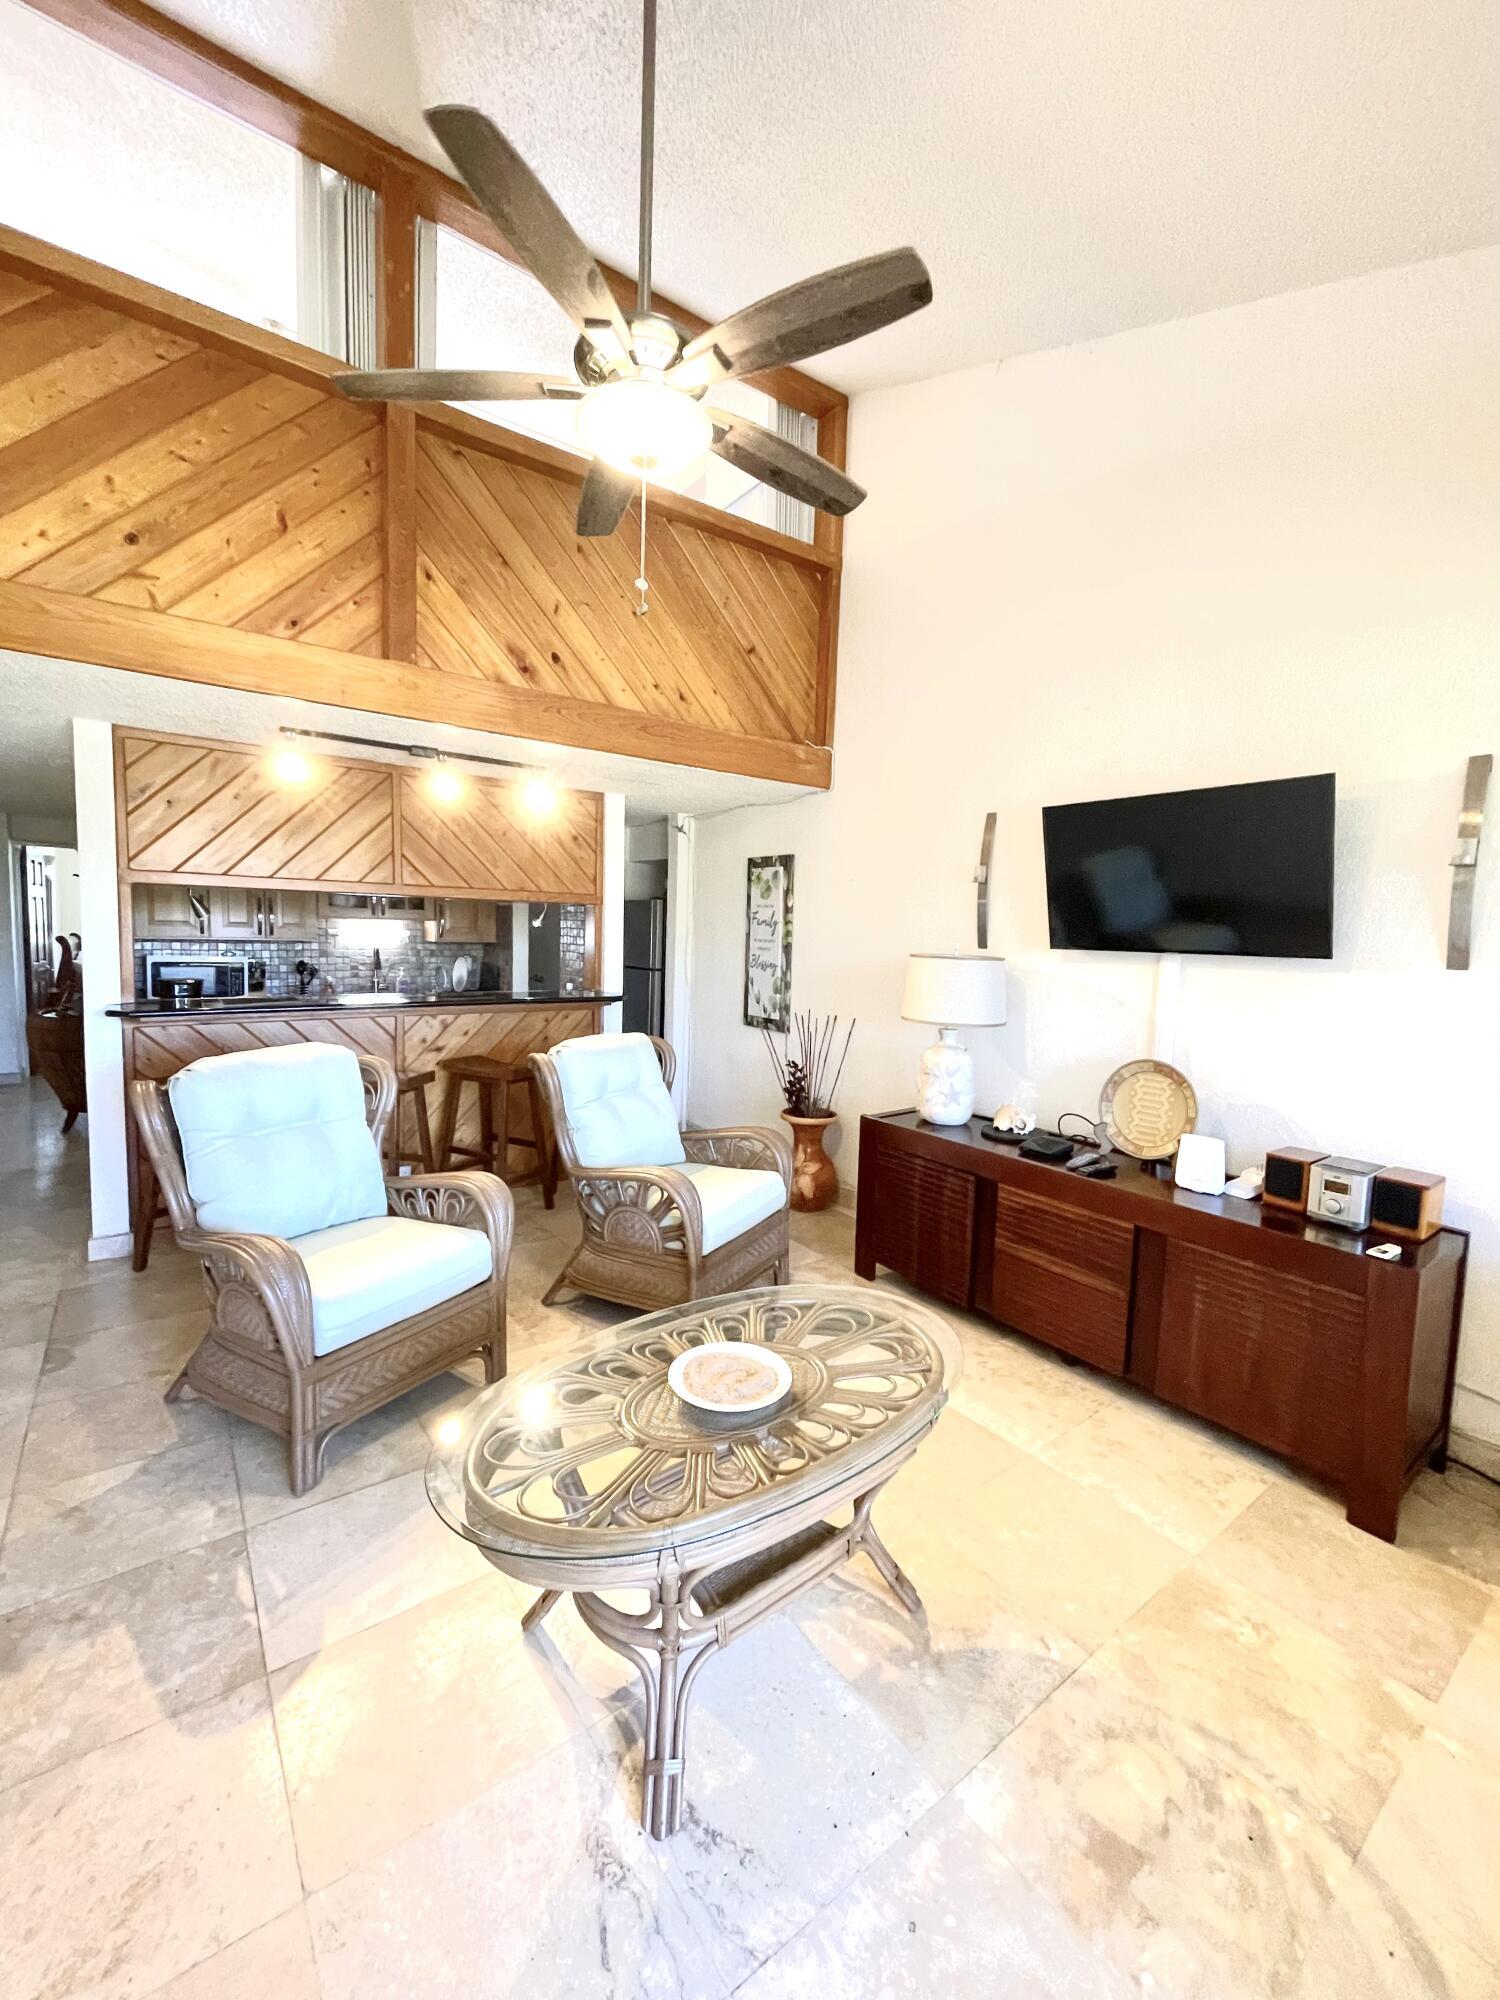 RE/MAX real estate, US Virgin Islands, Golden Rock Estate, Price Reduced  Condo Rental  Golden Rock CO